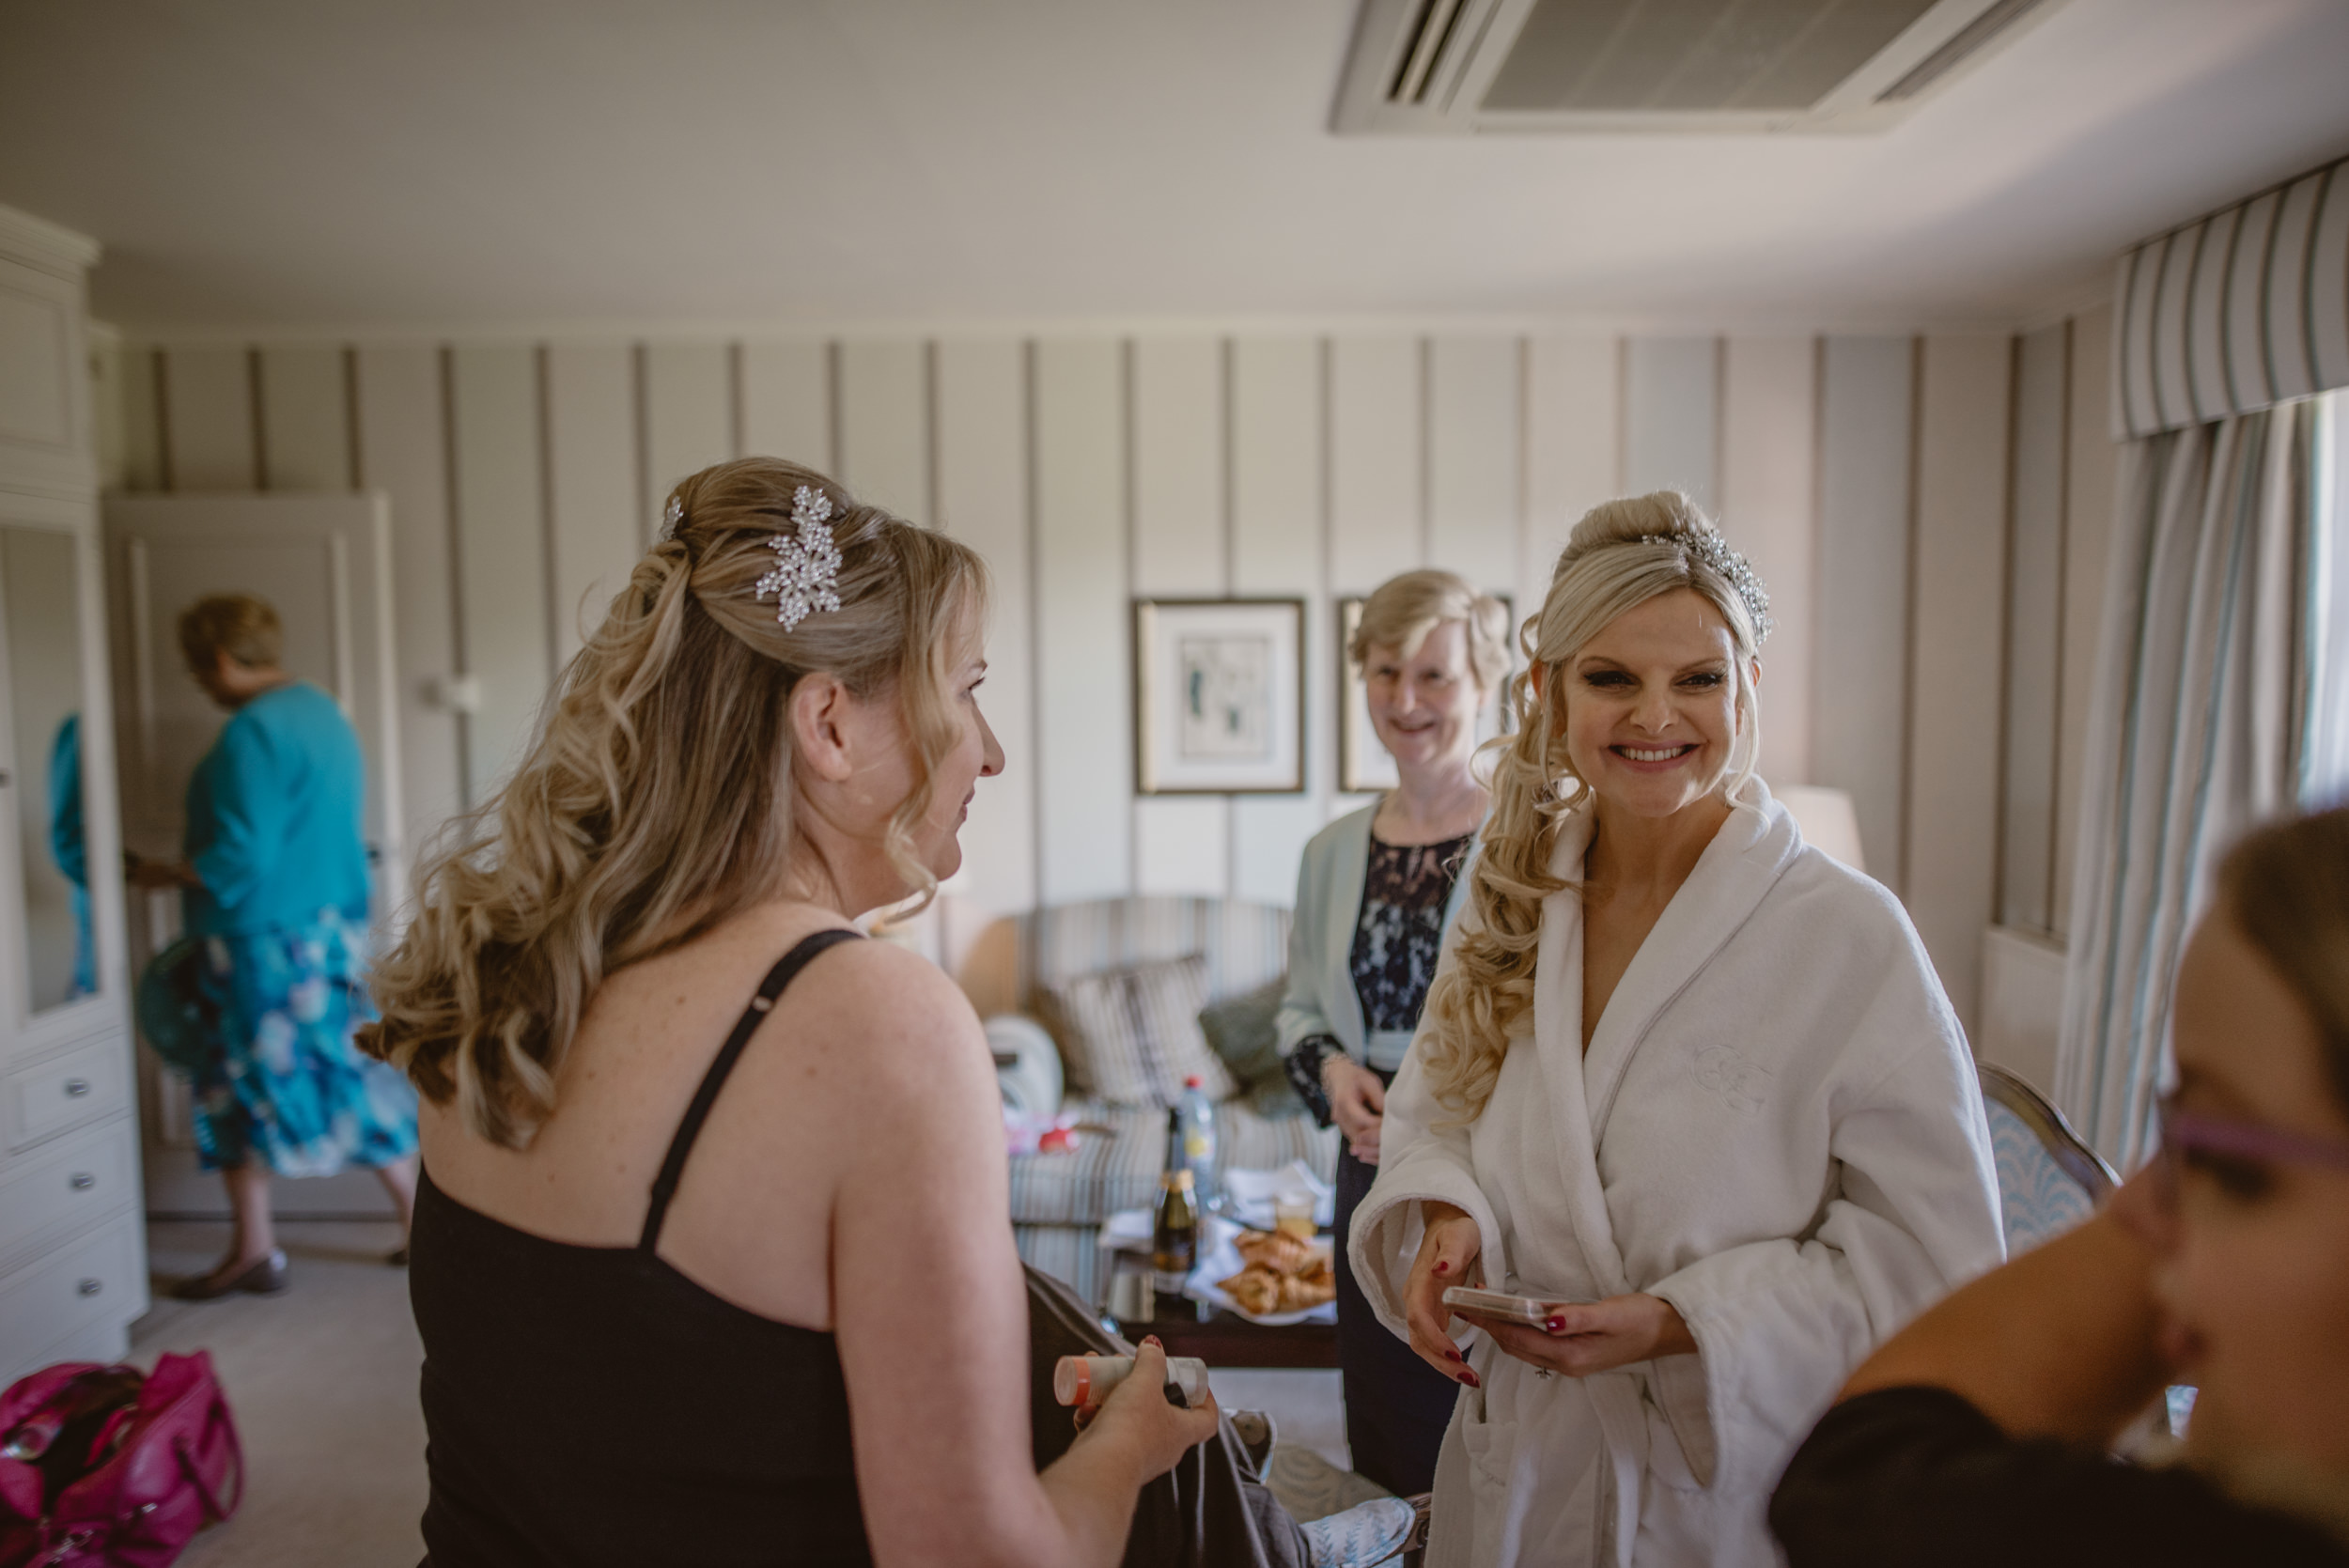 Trisha-and-Roger-wedding-The-Priory-Church-and-Chewton-Glen-Hotel-Christchurch-Manu-Mendoza-Wedding-Photography-029.jpg